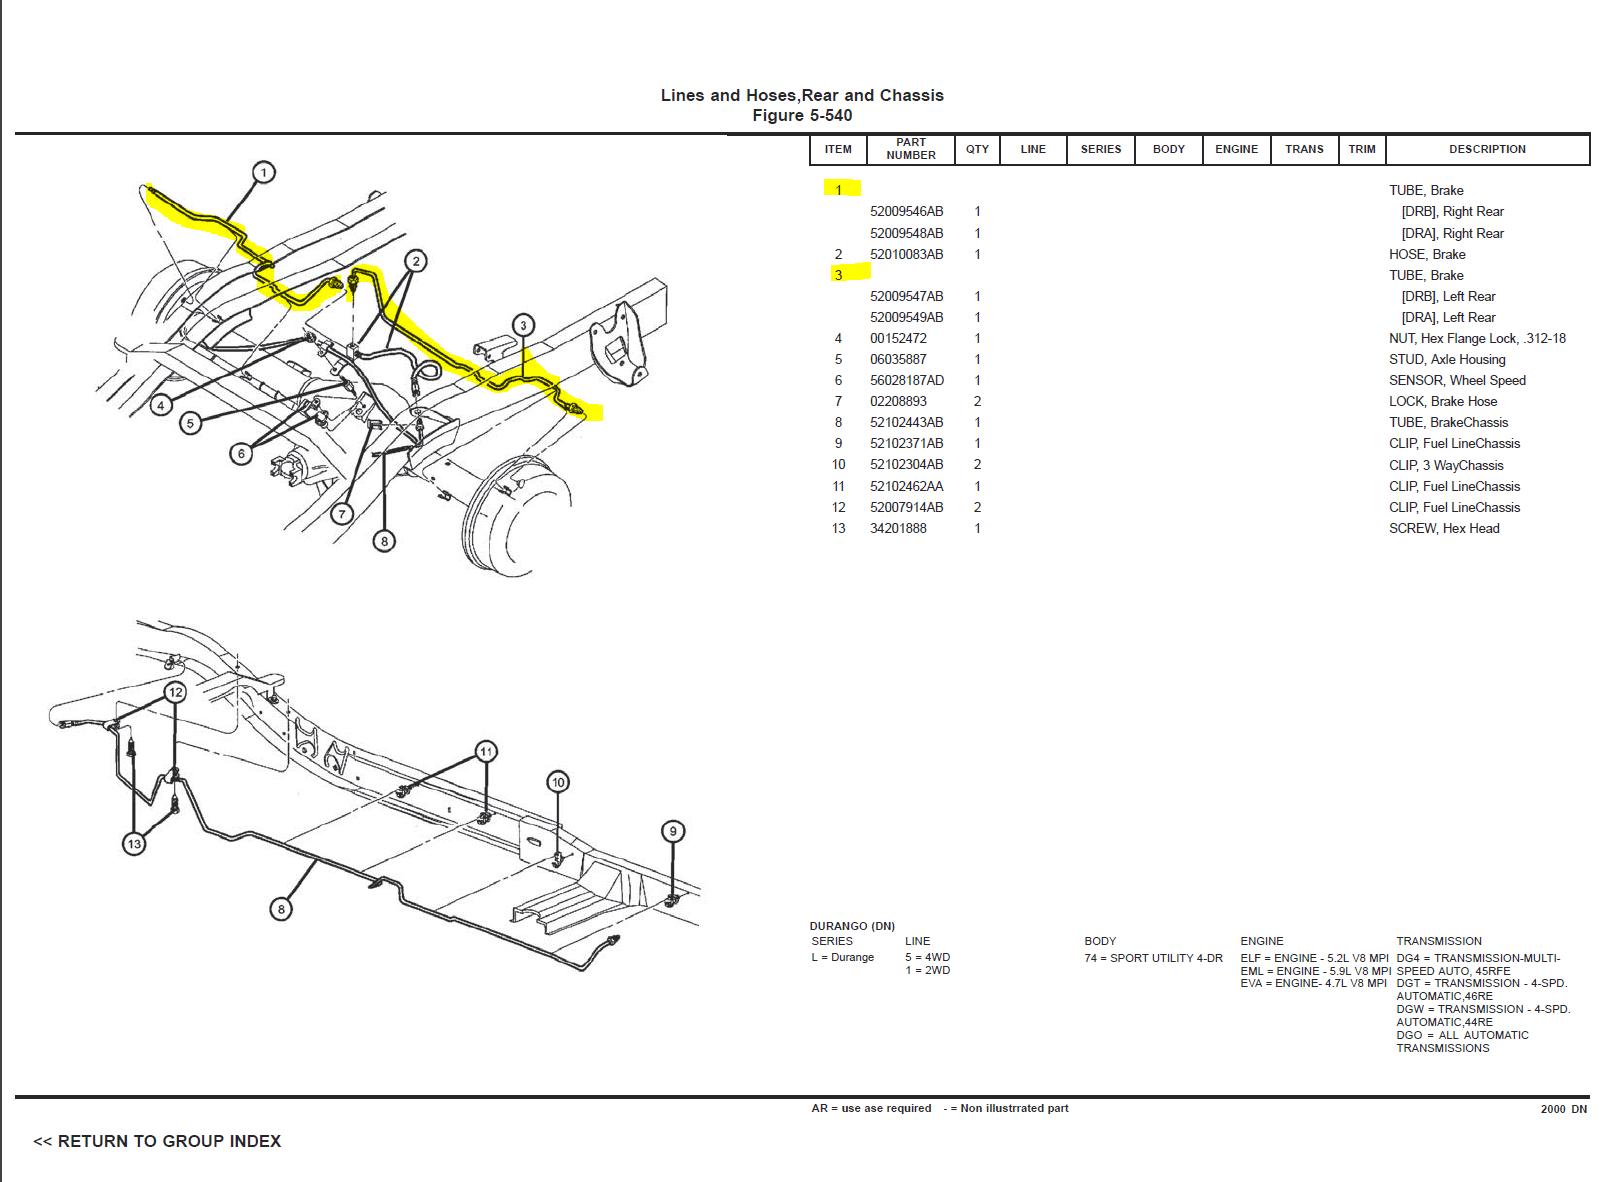 [DIAGRAM] 2001 Dodge Ram 4x4 Wiring Diagram Rear FULL